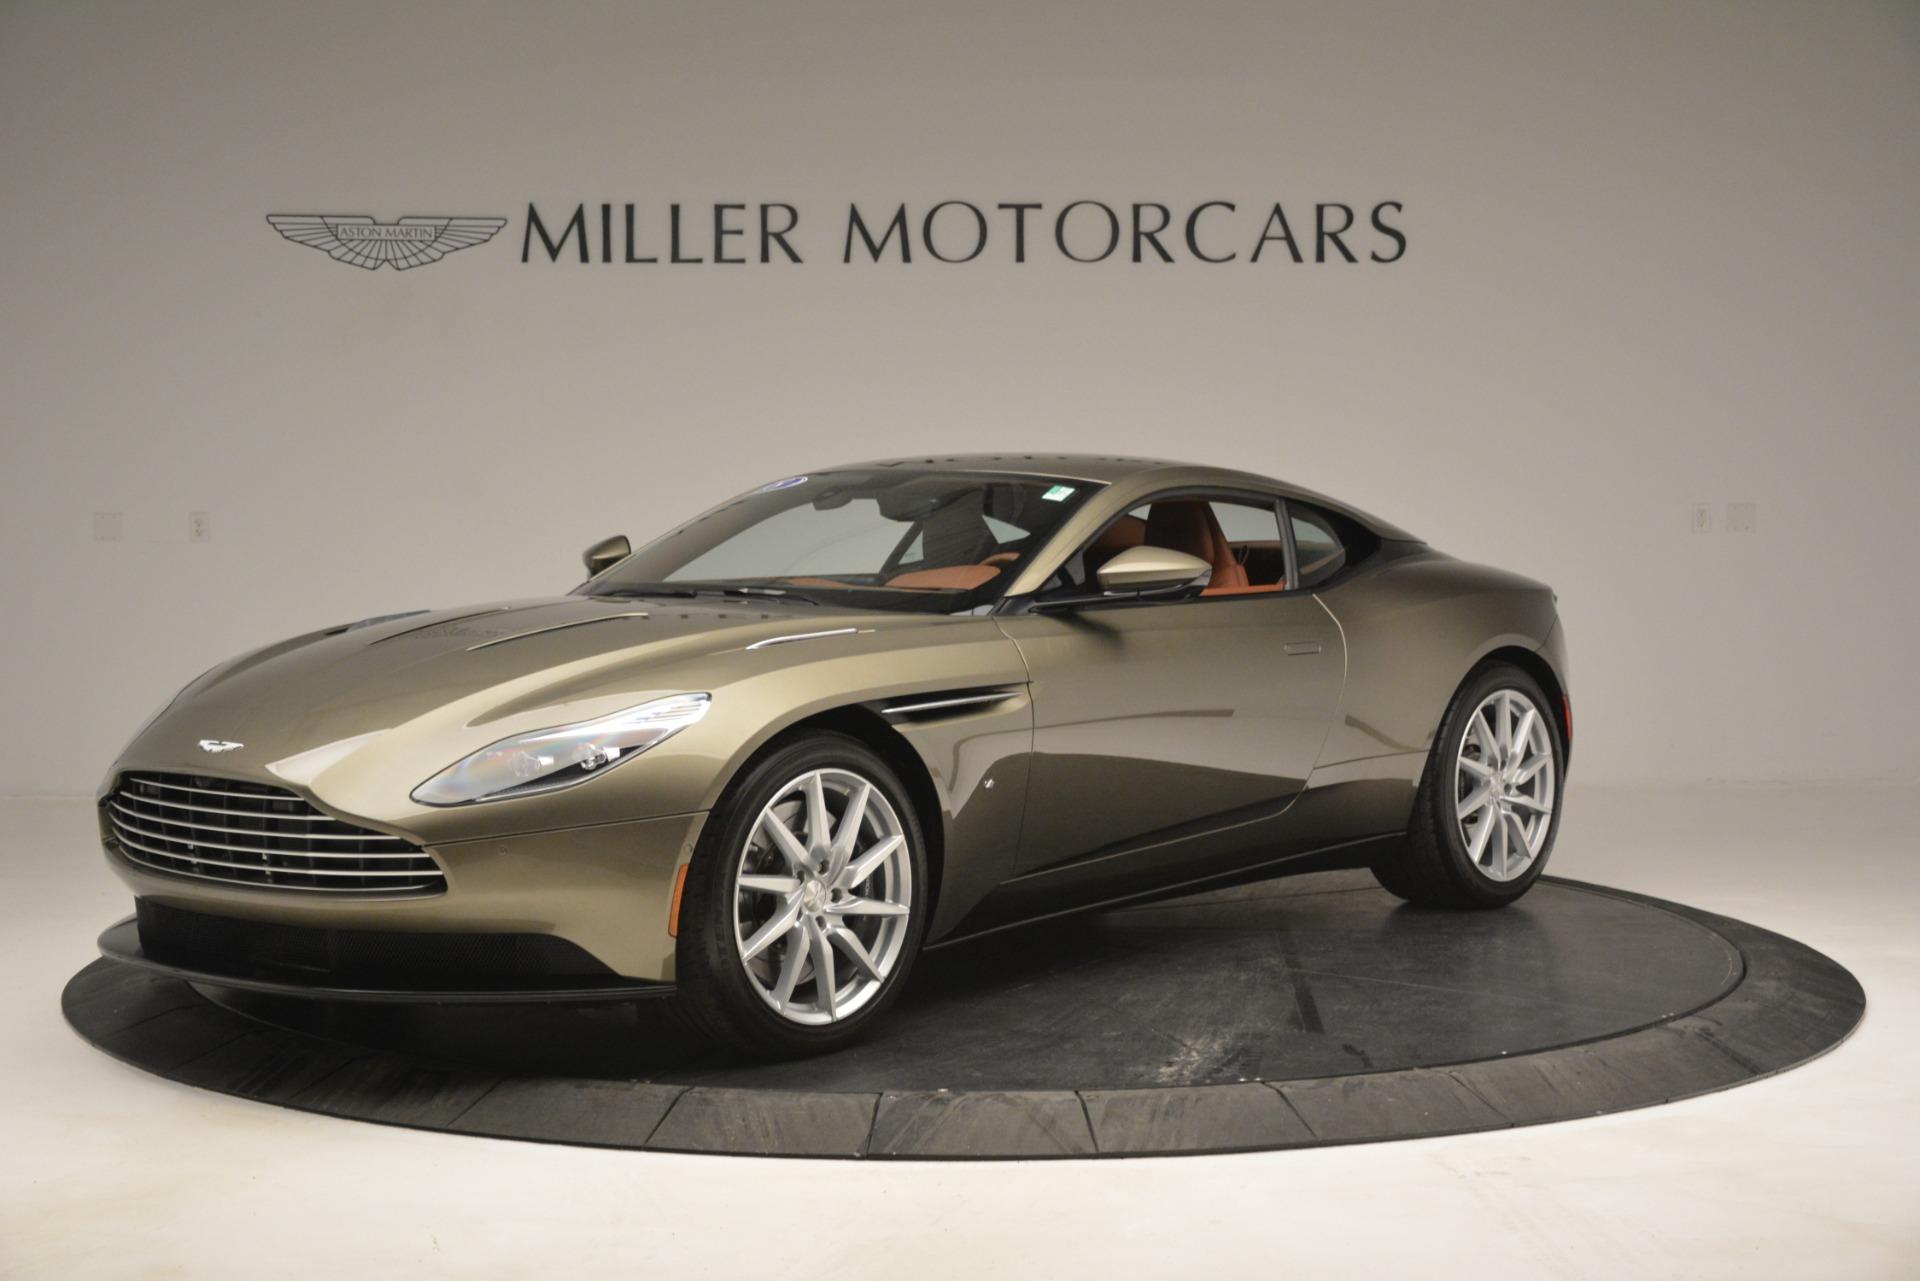 Used 2018 Aston Martin DB11 V12 Coupe for sale Sold at Bugatti of Greenwich in Greenwich CT 06830 1